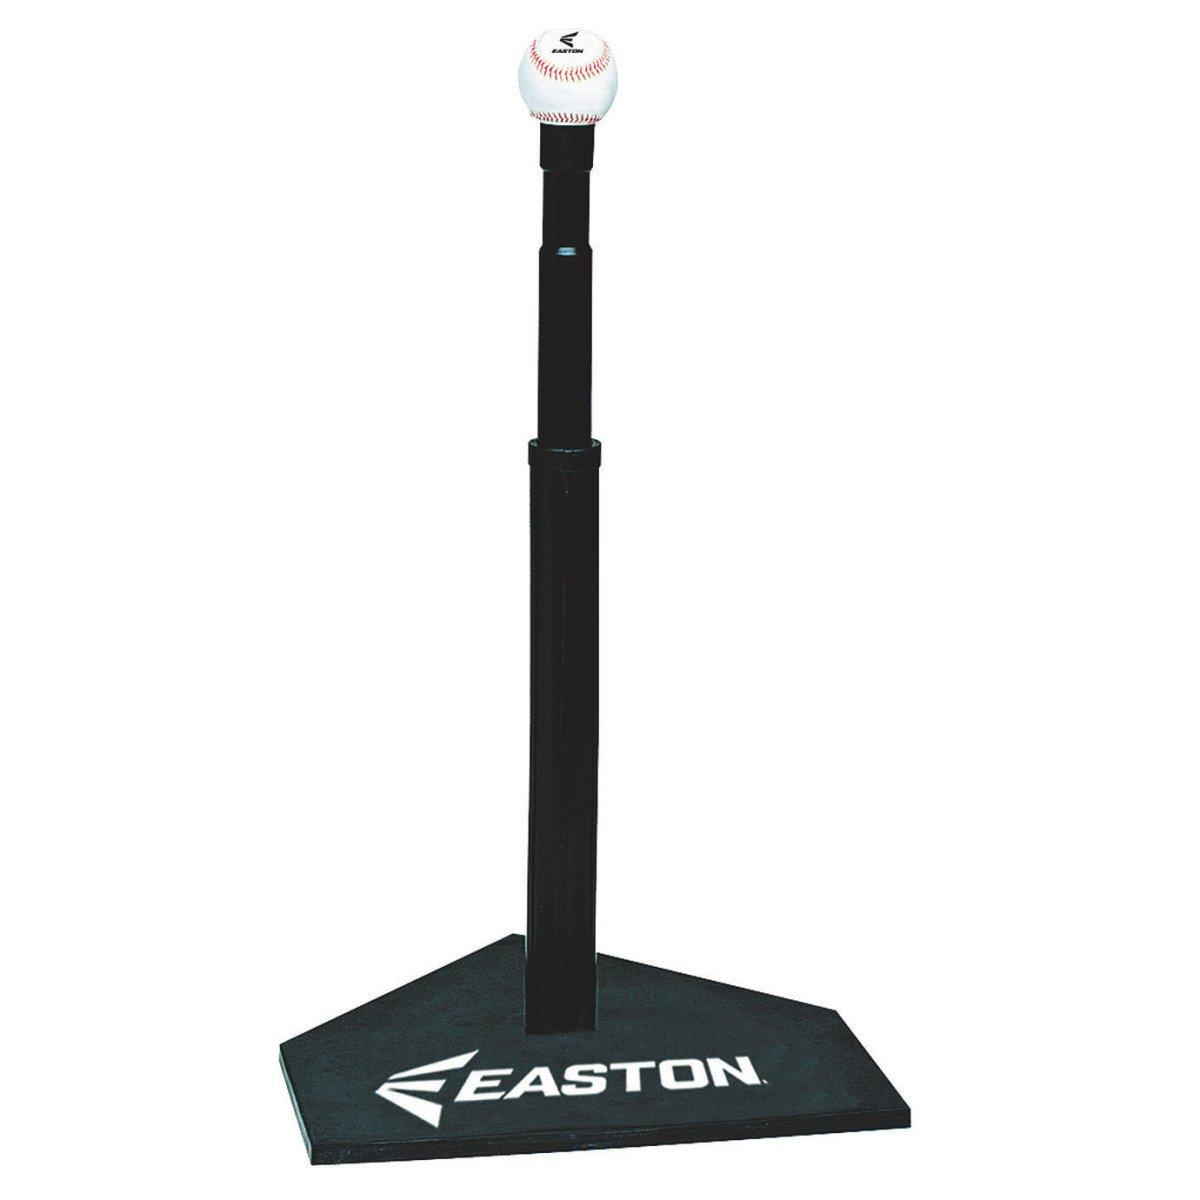 Easton Deluxe Batting Tee Easton Sports Inc. A162674